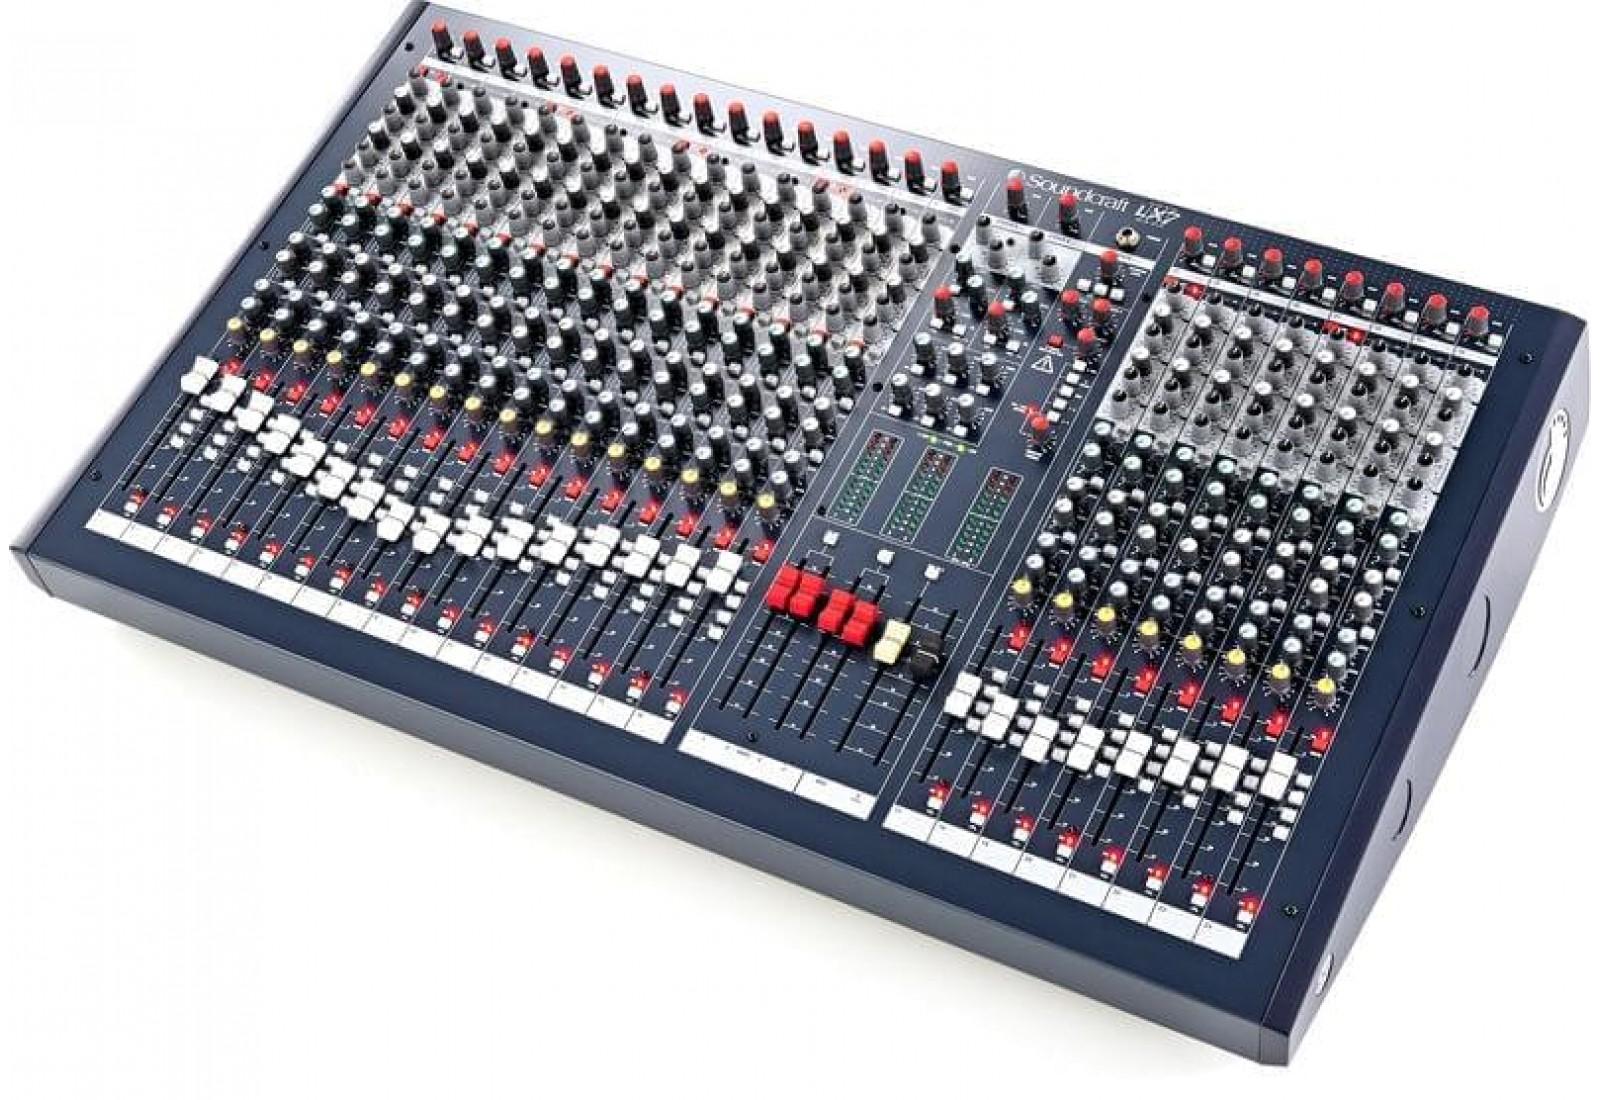 Soundcraft LX-7 II 24